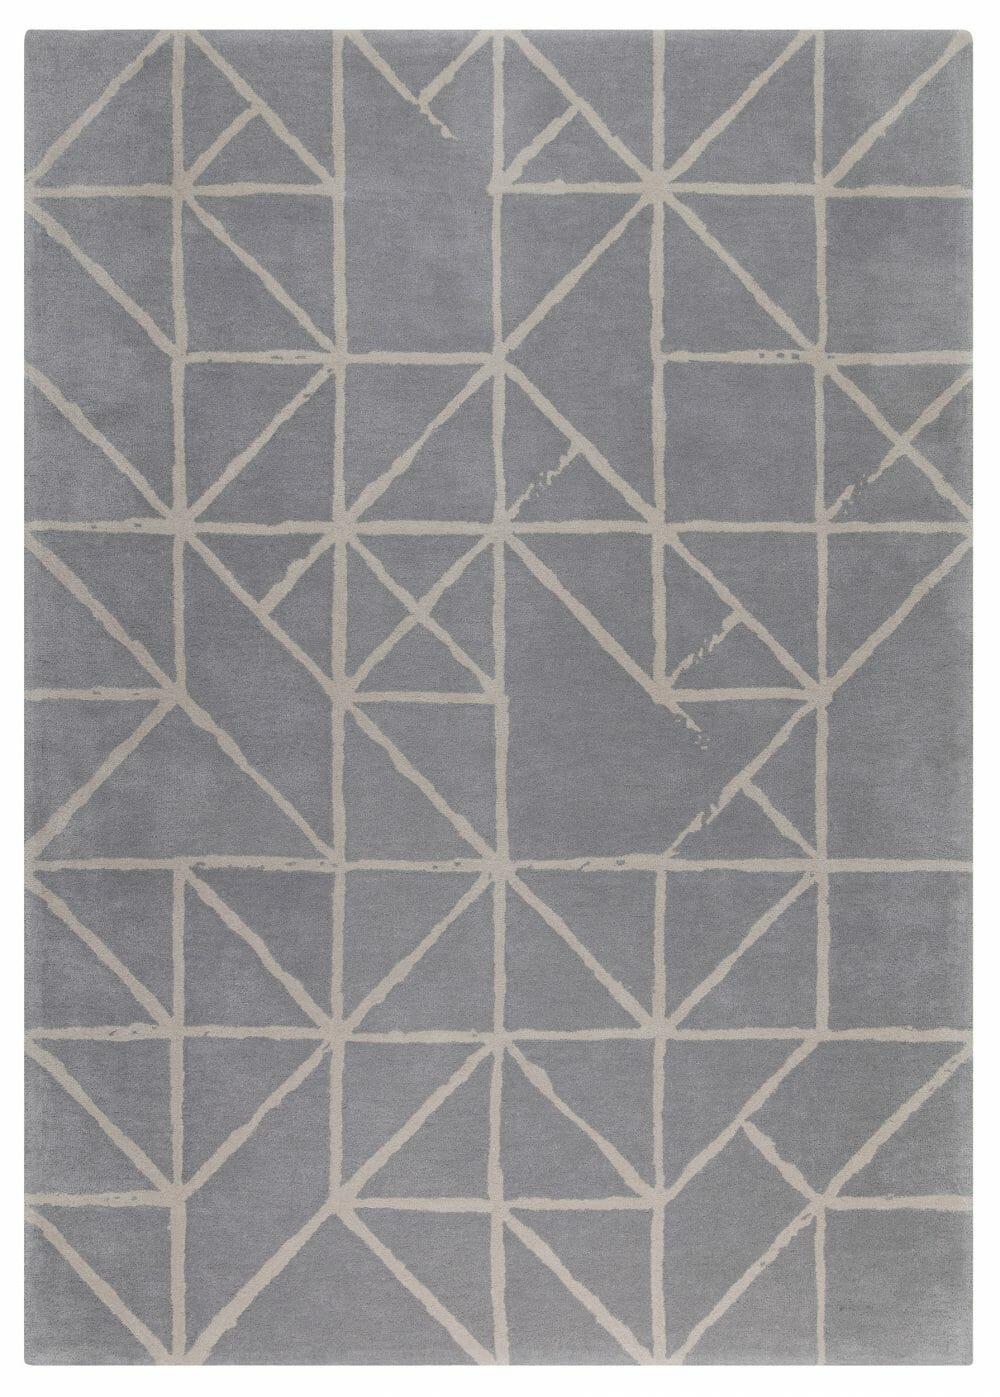 guernsey-gris-rug-homeware-decor-craft-home-interiors